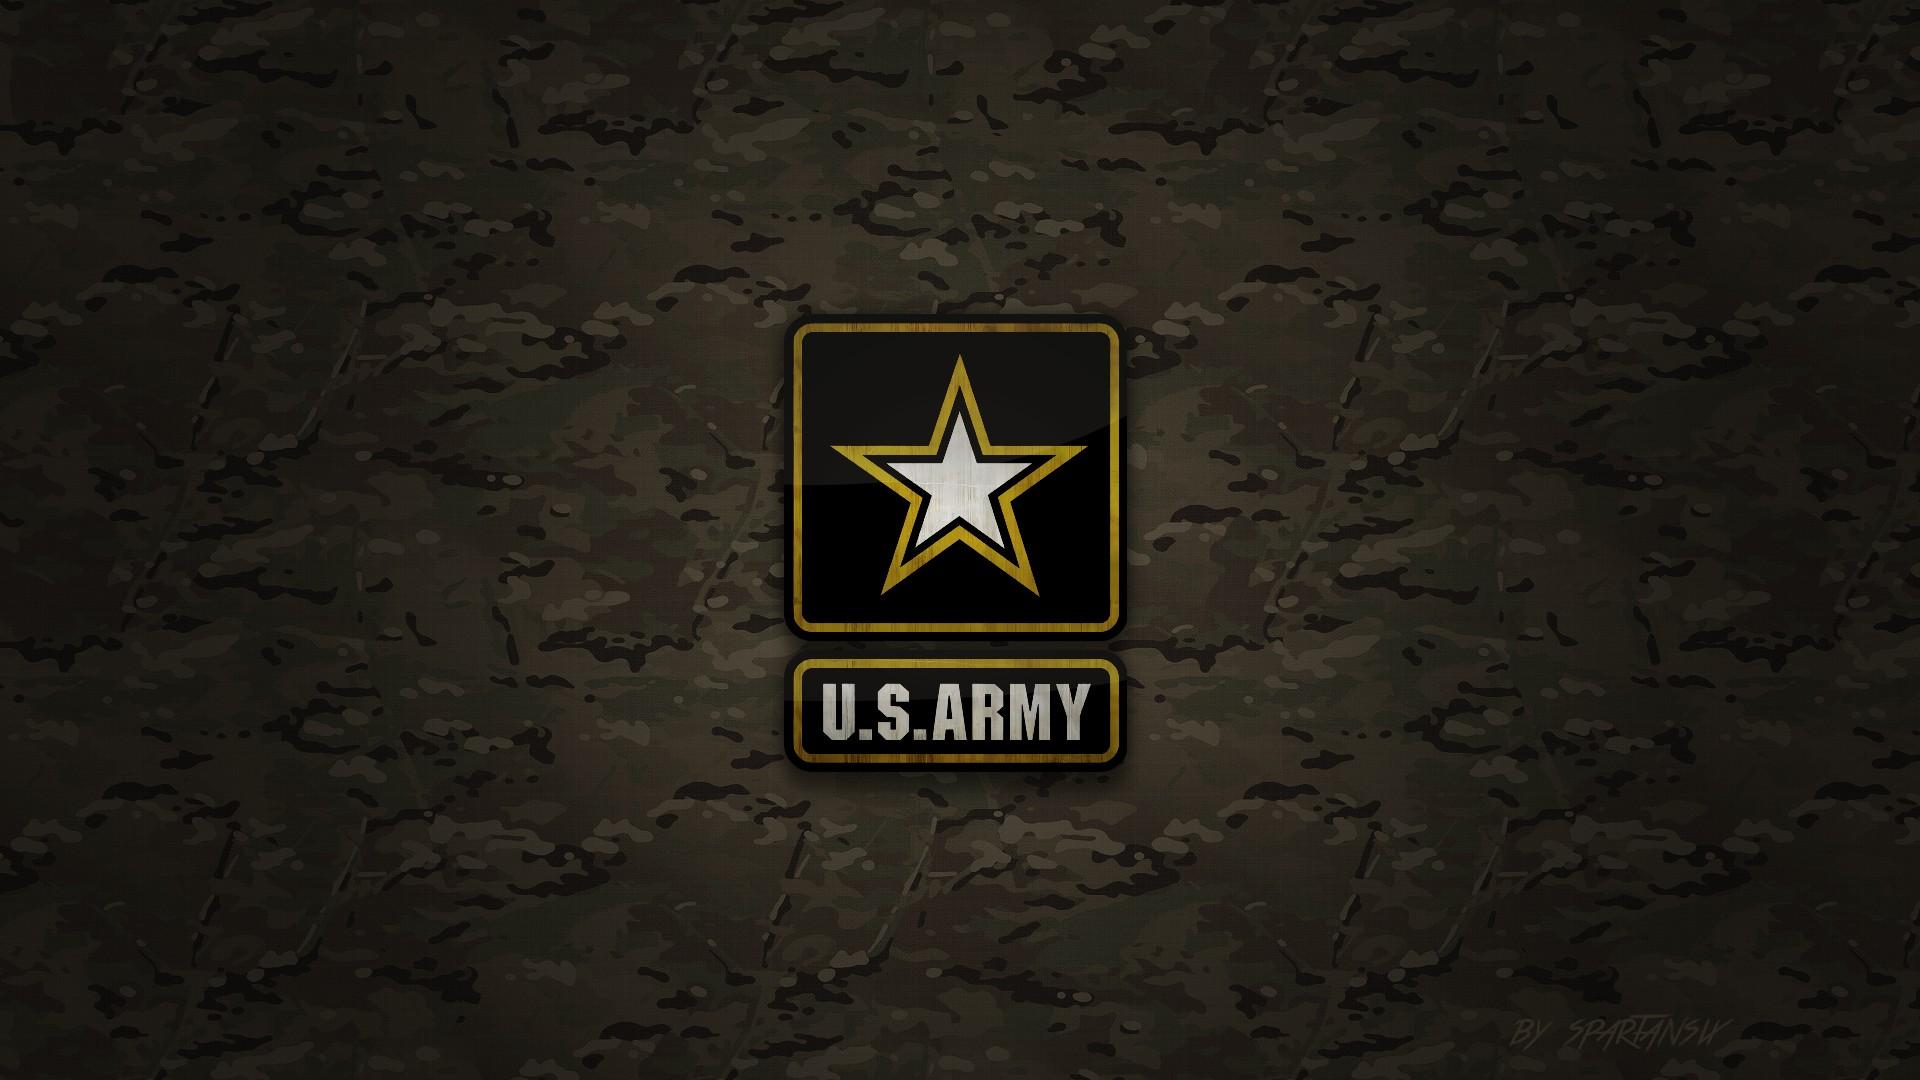 Download Us Army Wallpaper Hd 51: US Army Wallpaper ·① Download Free Beautiful HD